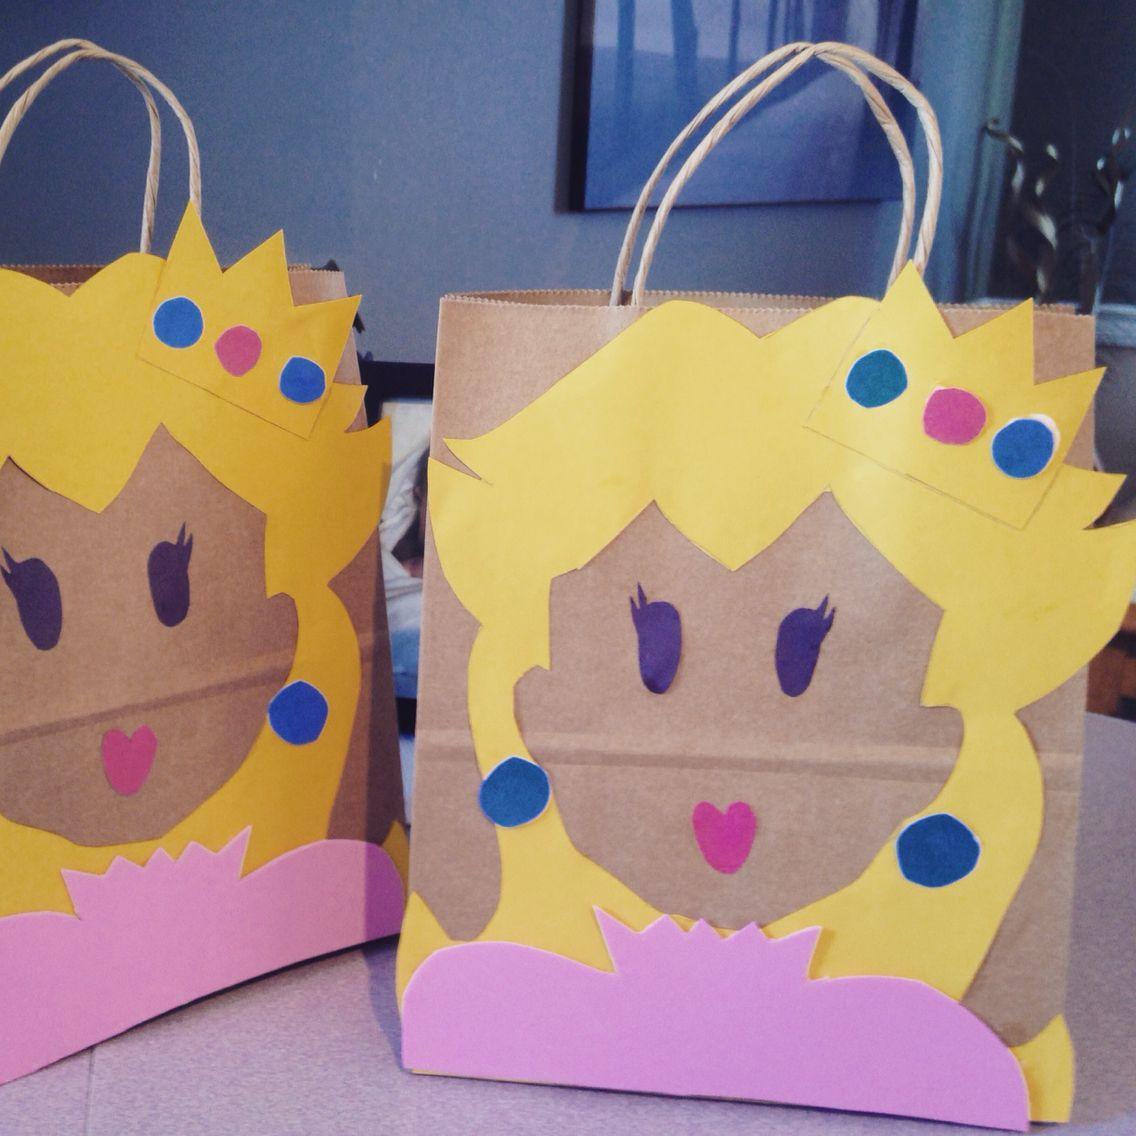 Princess peach loot bags for Mario themed birthday parties